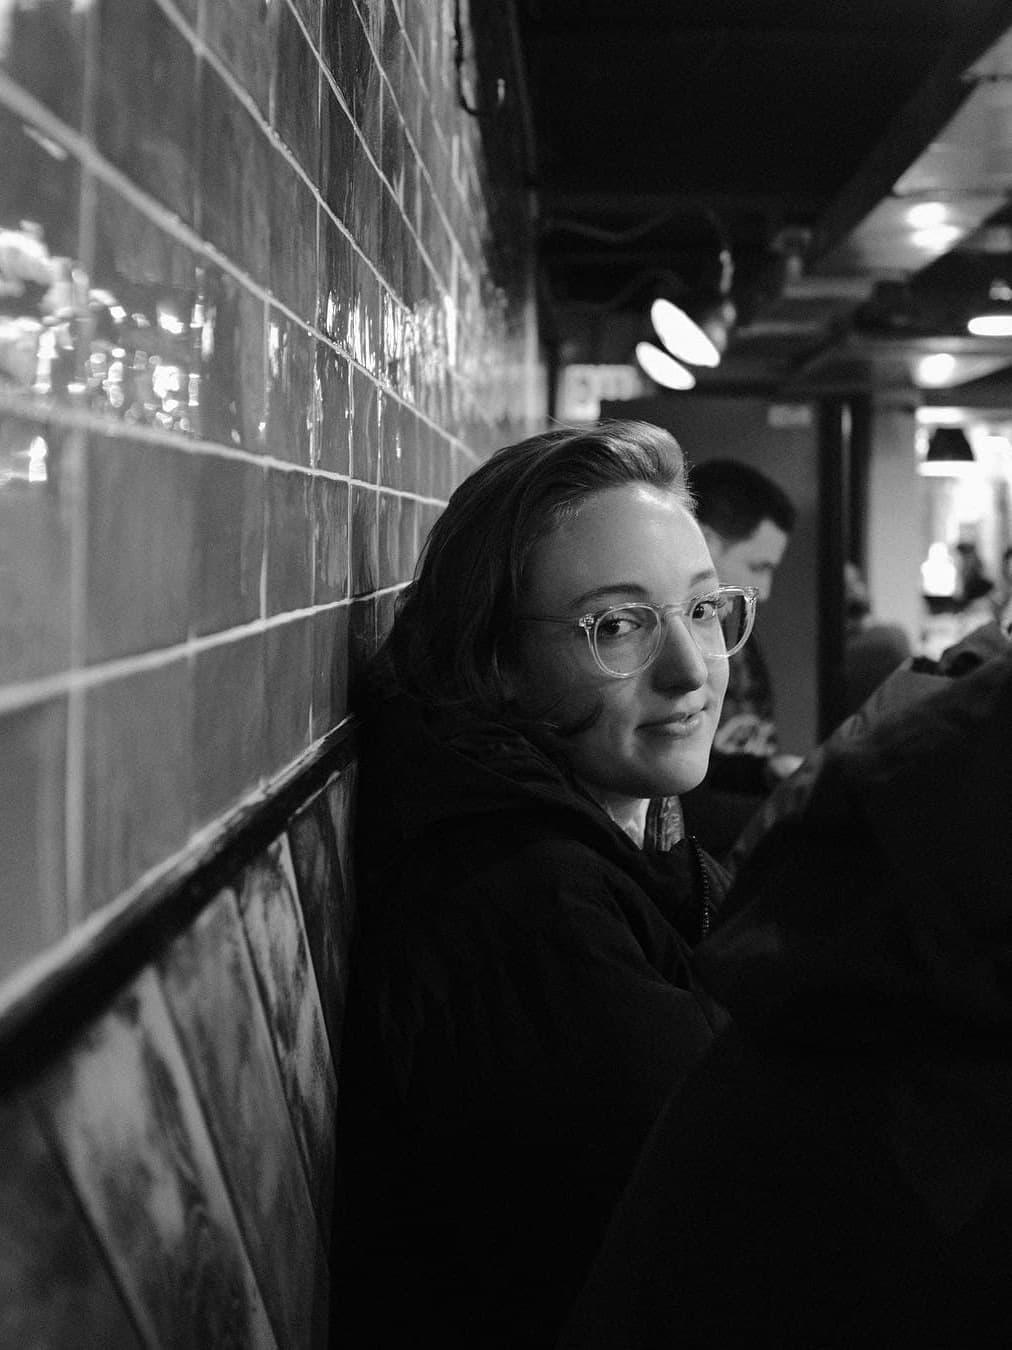 patron at miznon chelsea market nyc looking over